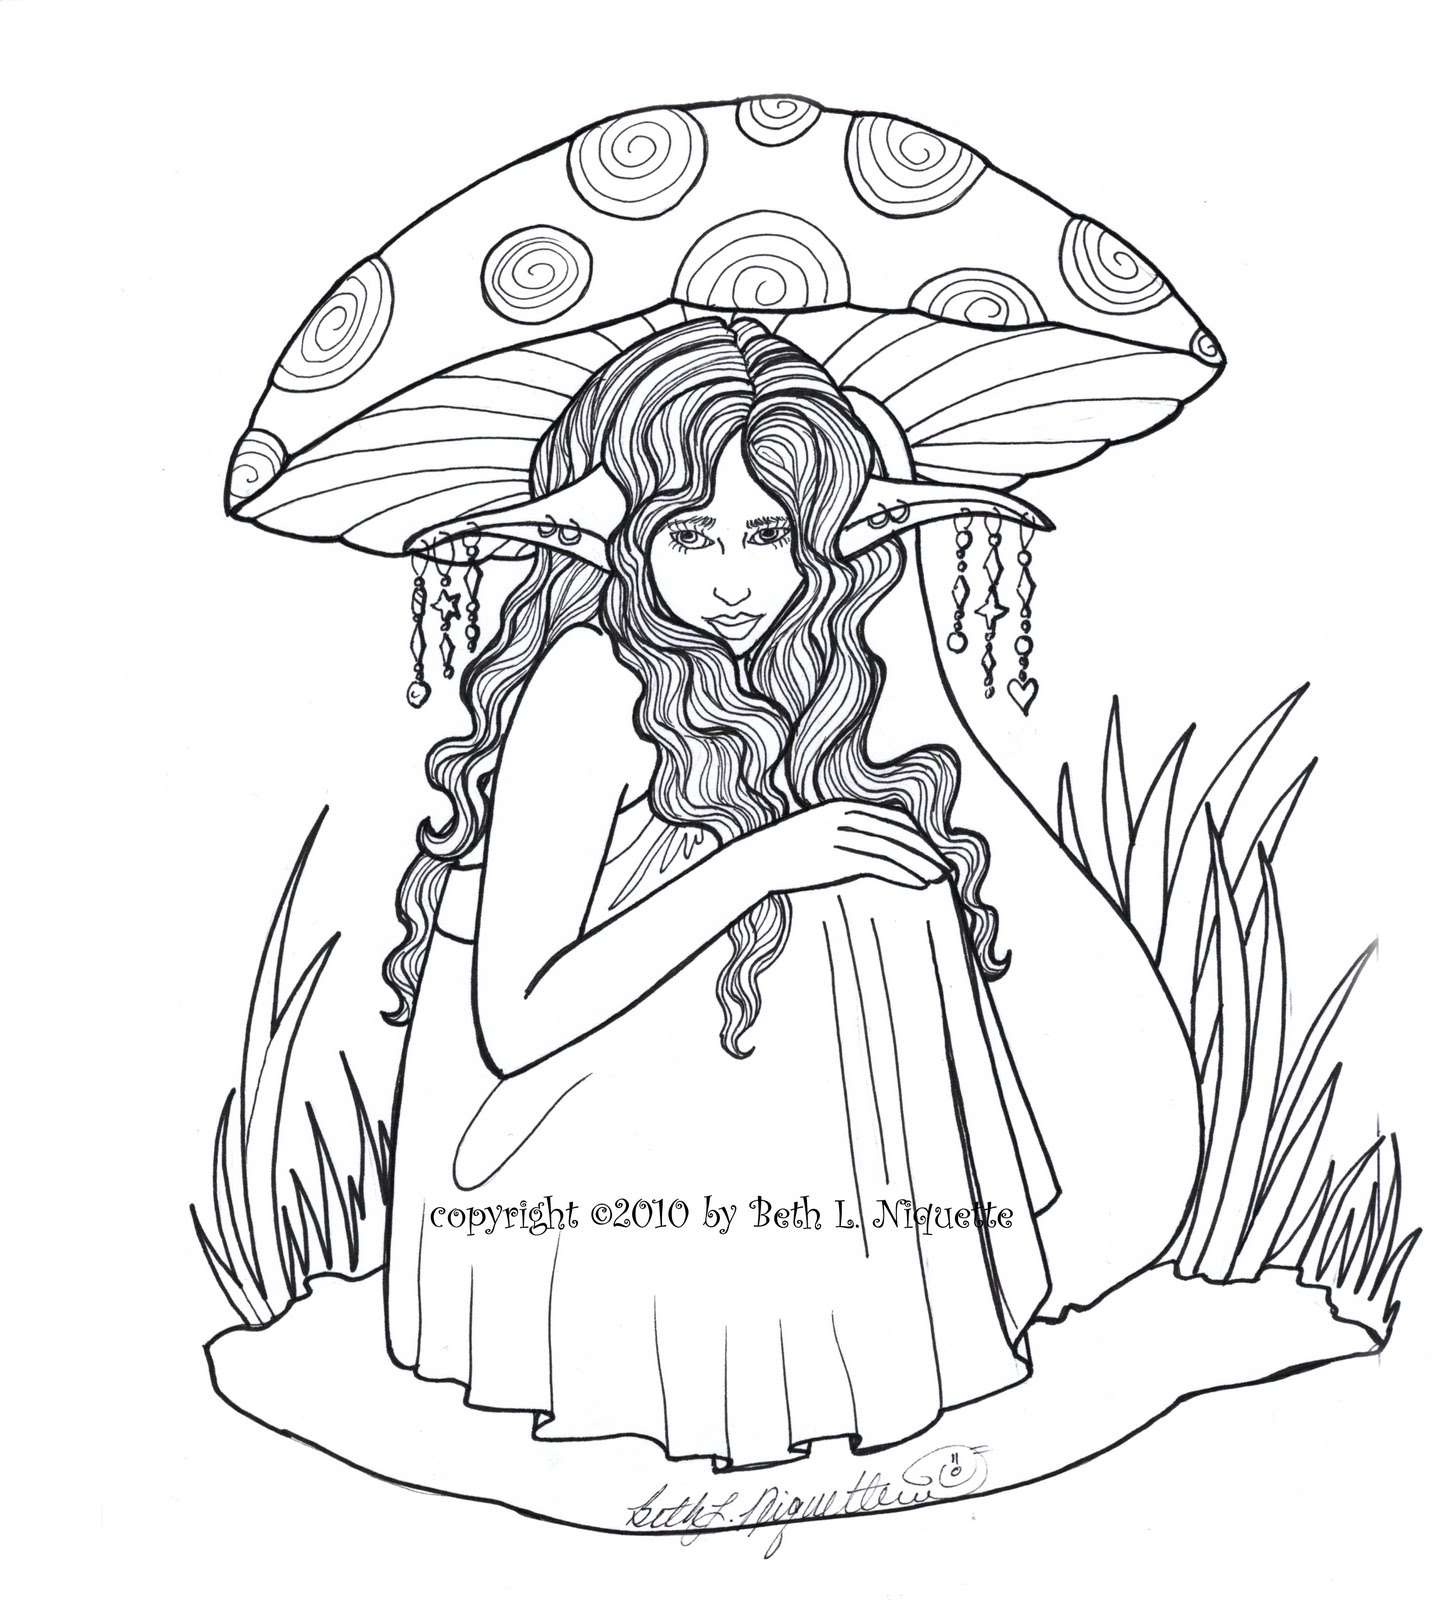 1432x1600 Beth's Artworx Beneath The Mushroom